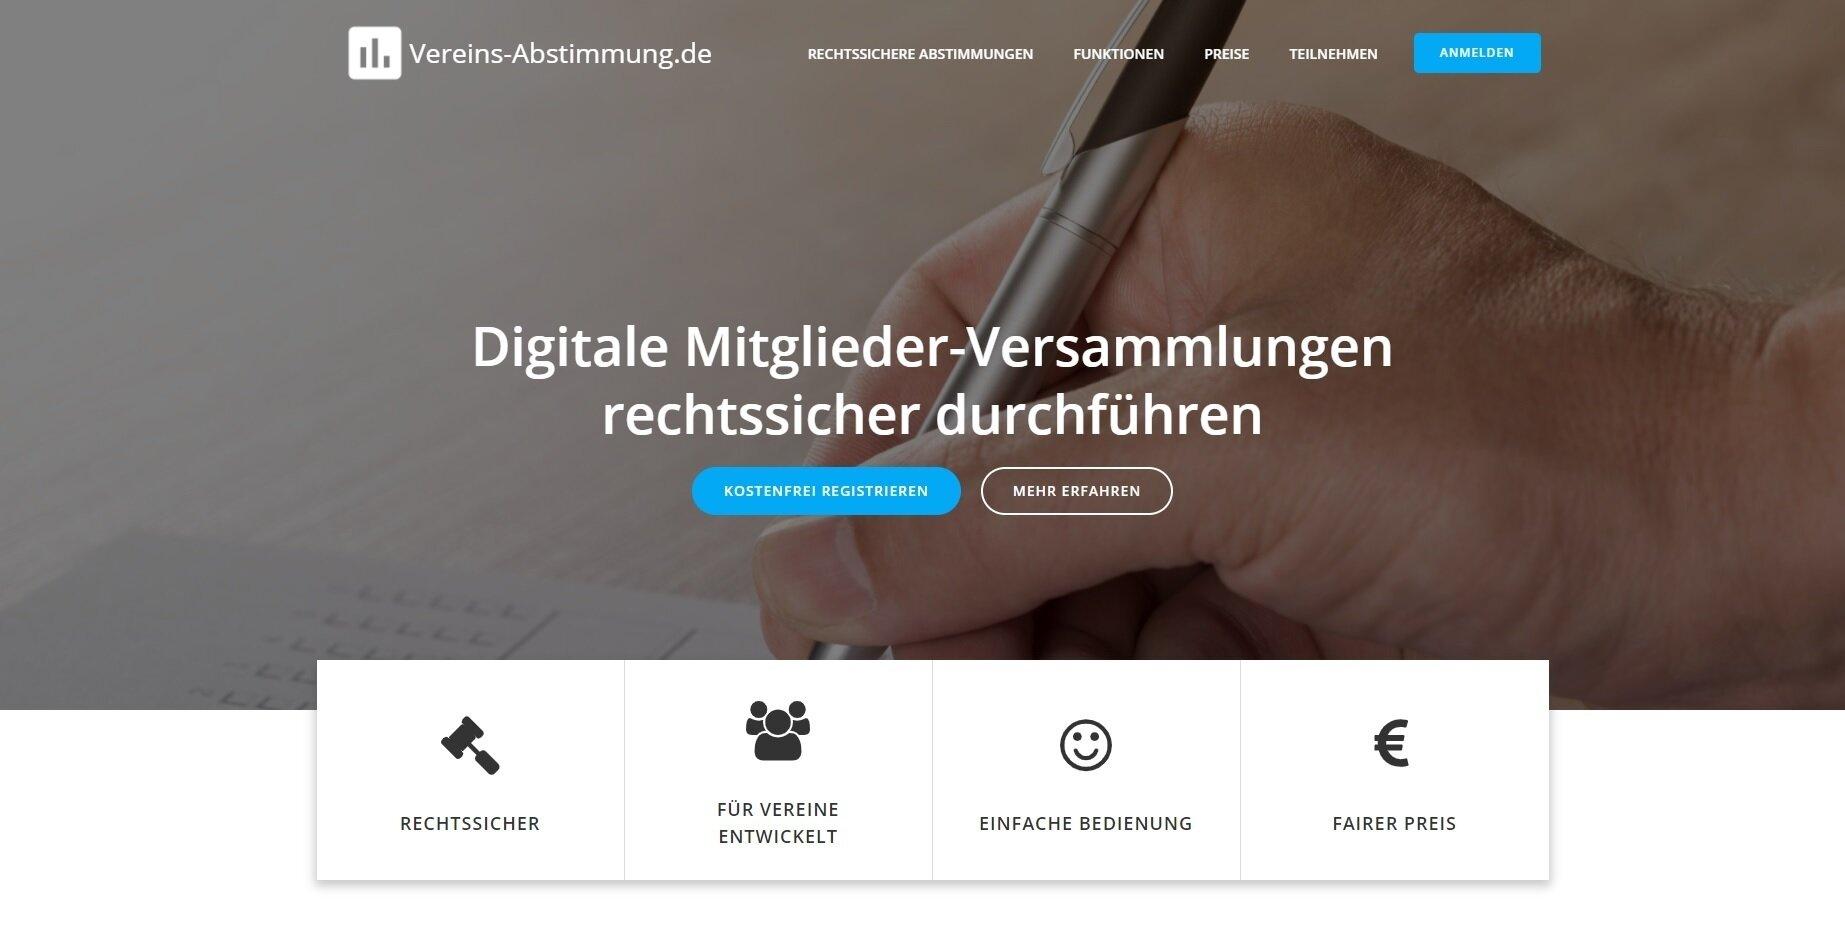 Online-Abstimmungstool